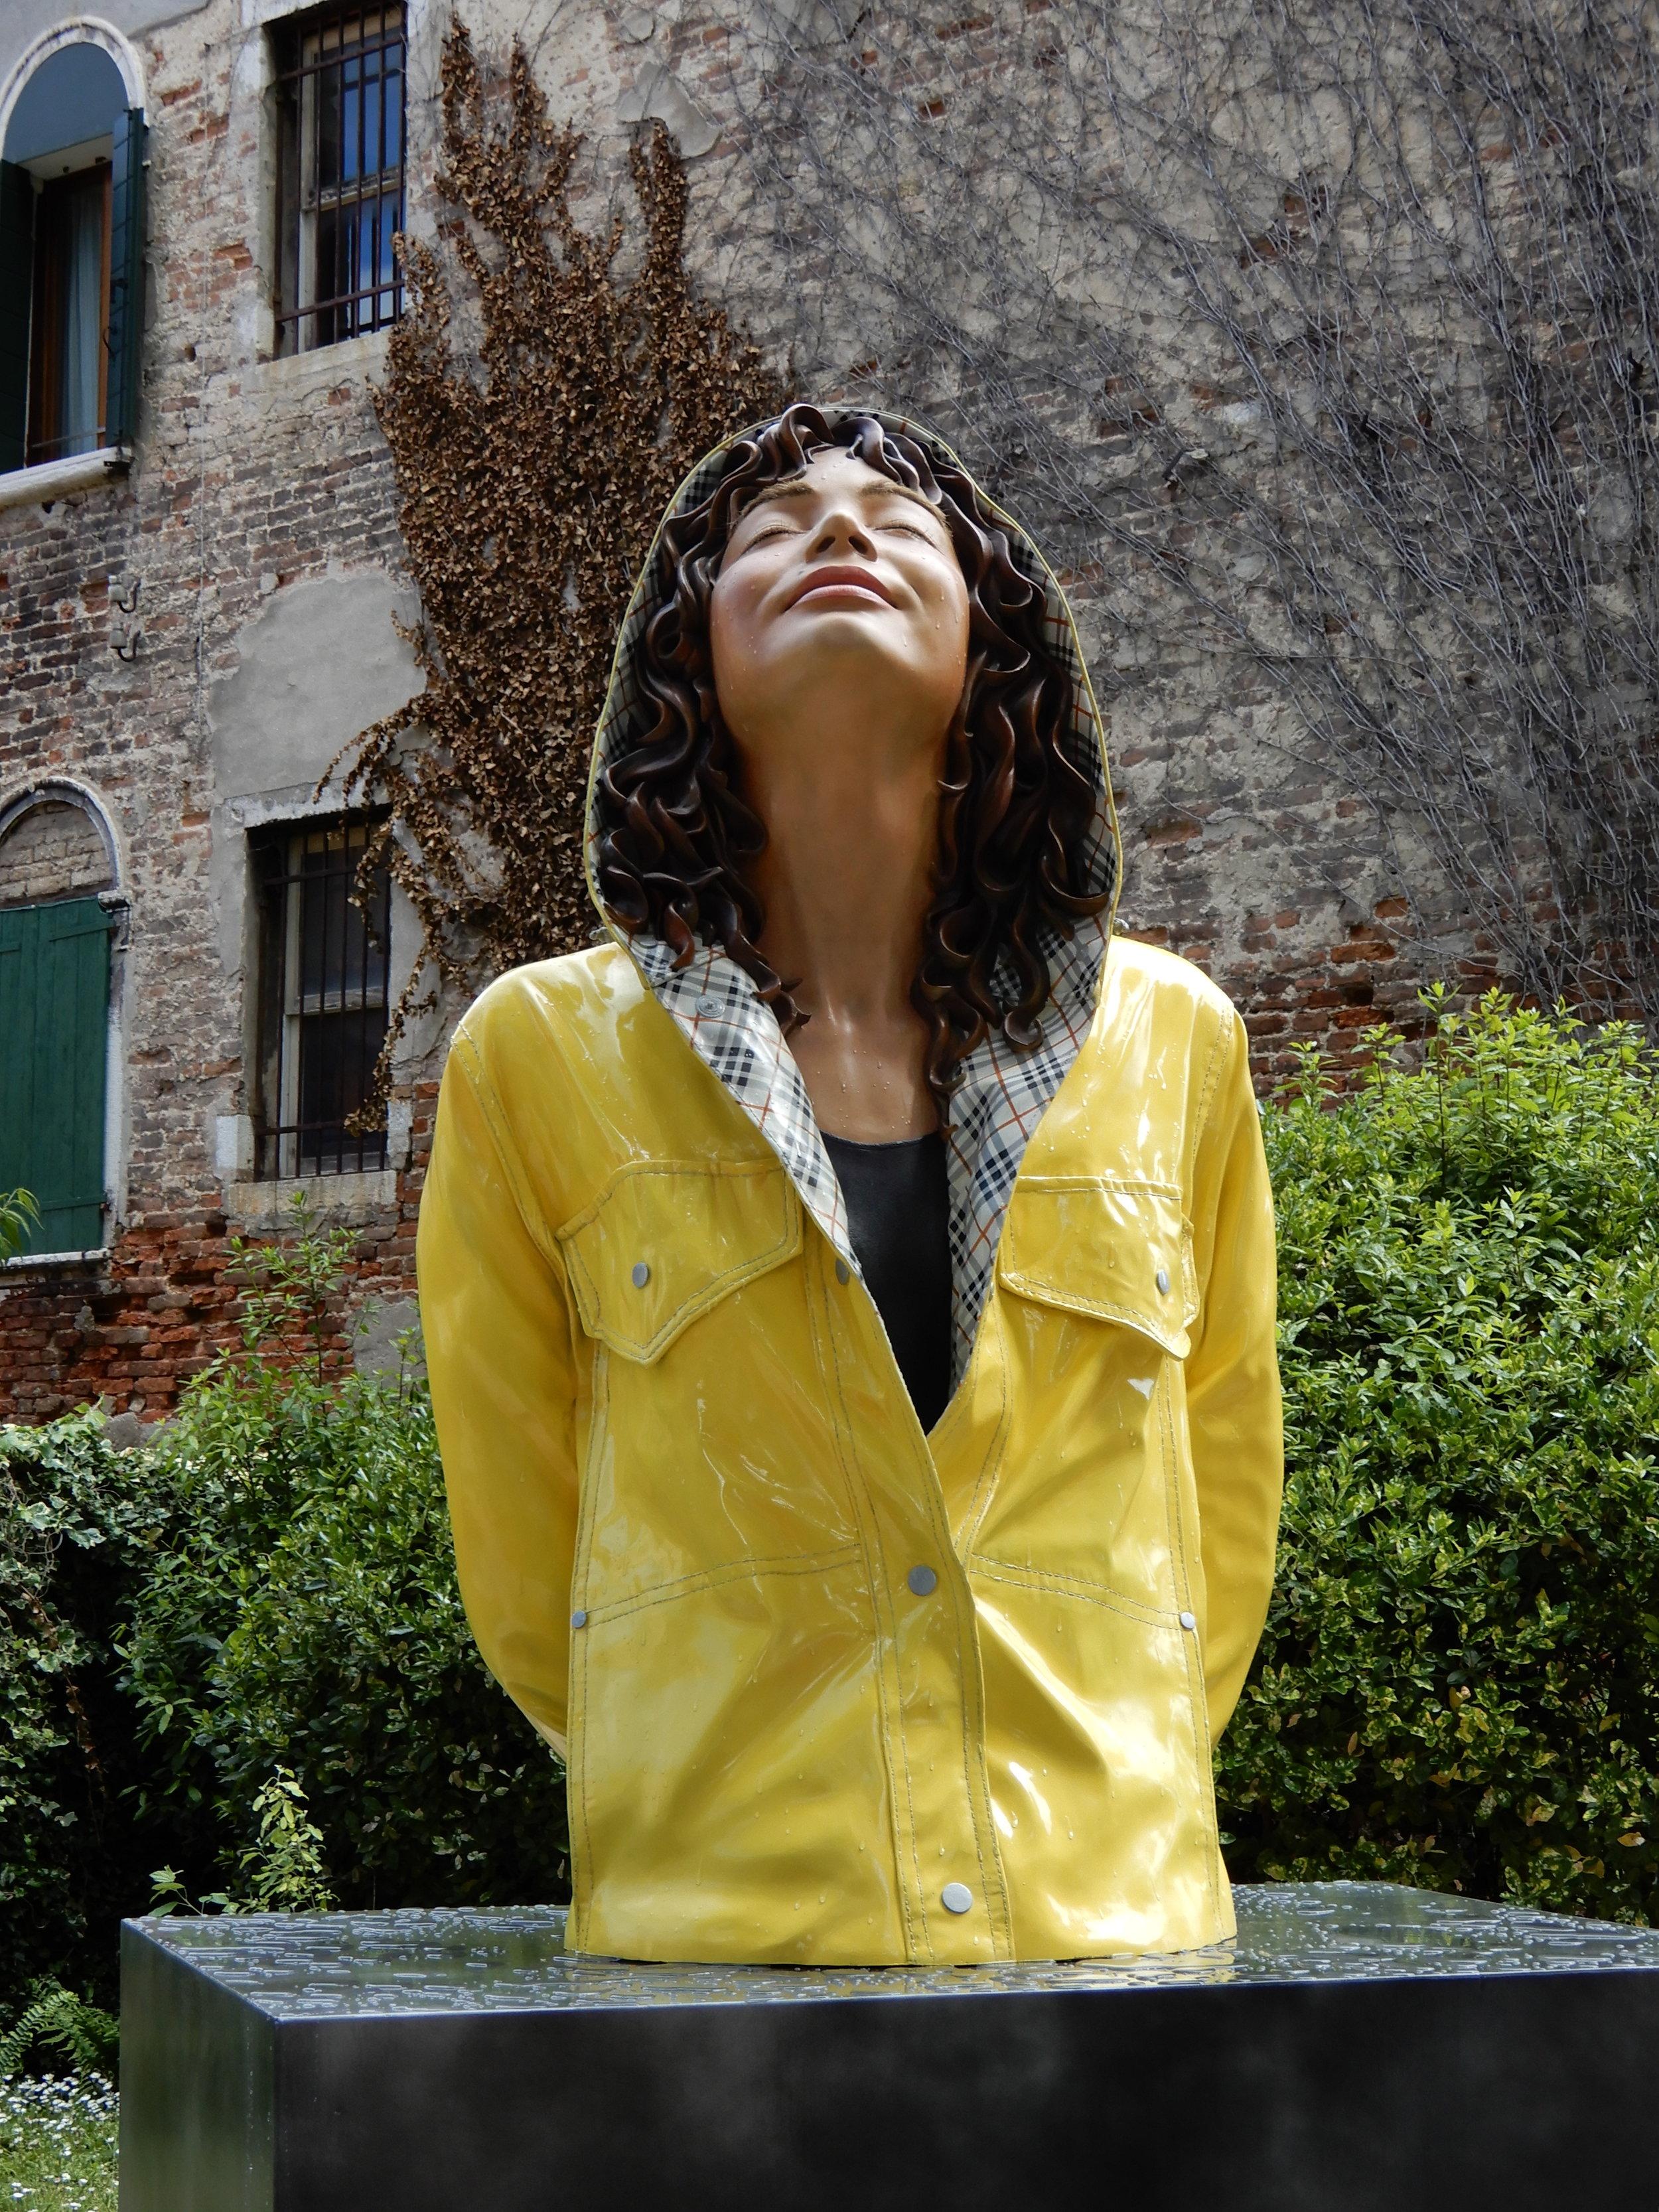 "New York City Slicker, 2013, Giardini Marinaressa, Italy, Lacquer on Bronze, 38"" x 28"" x 63"""